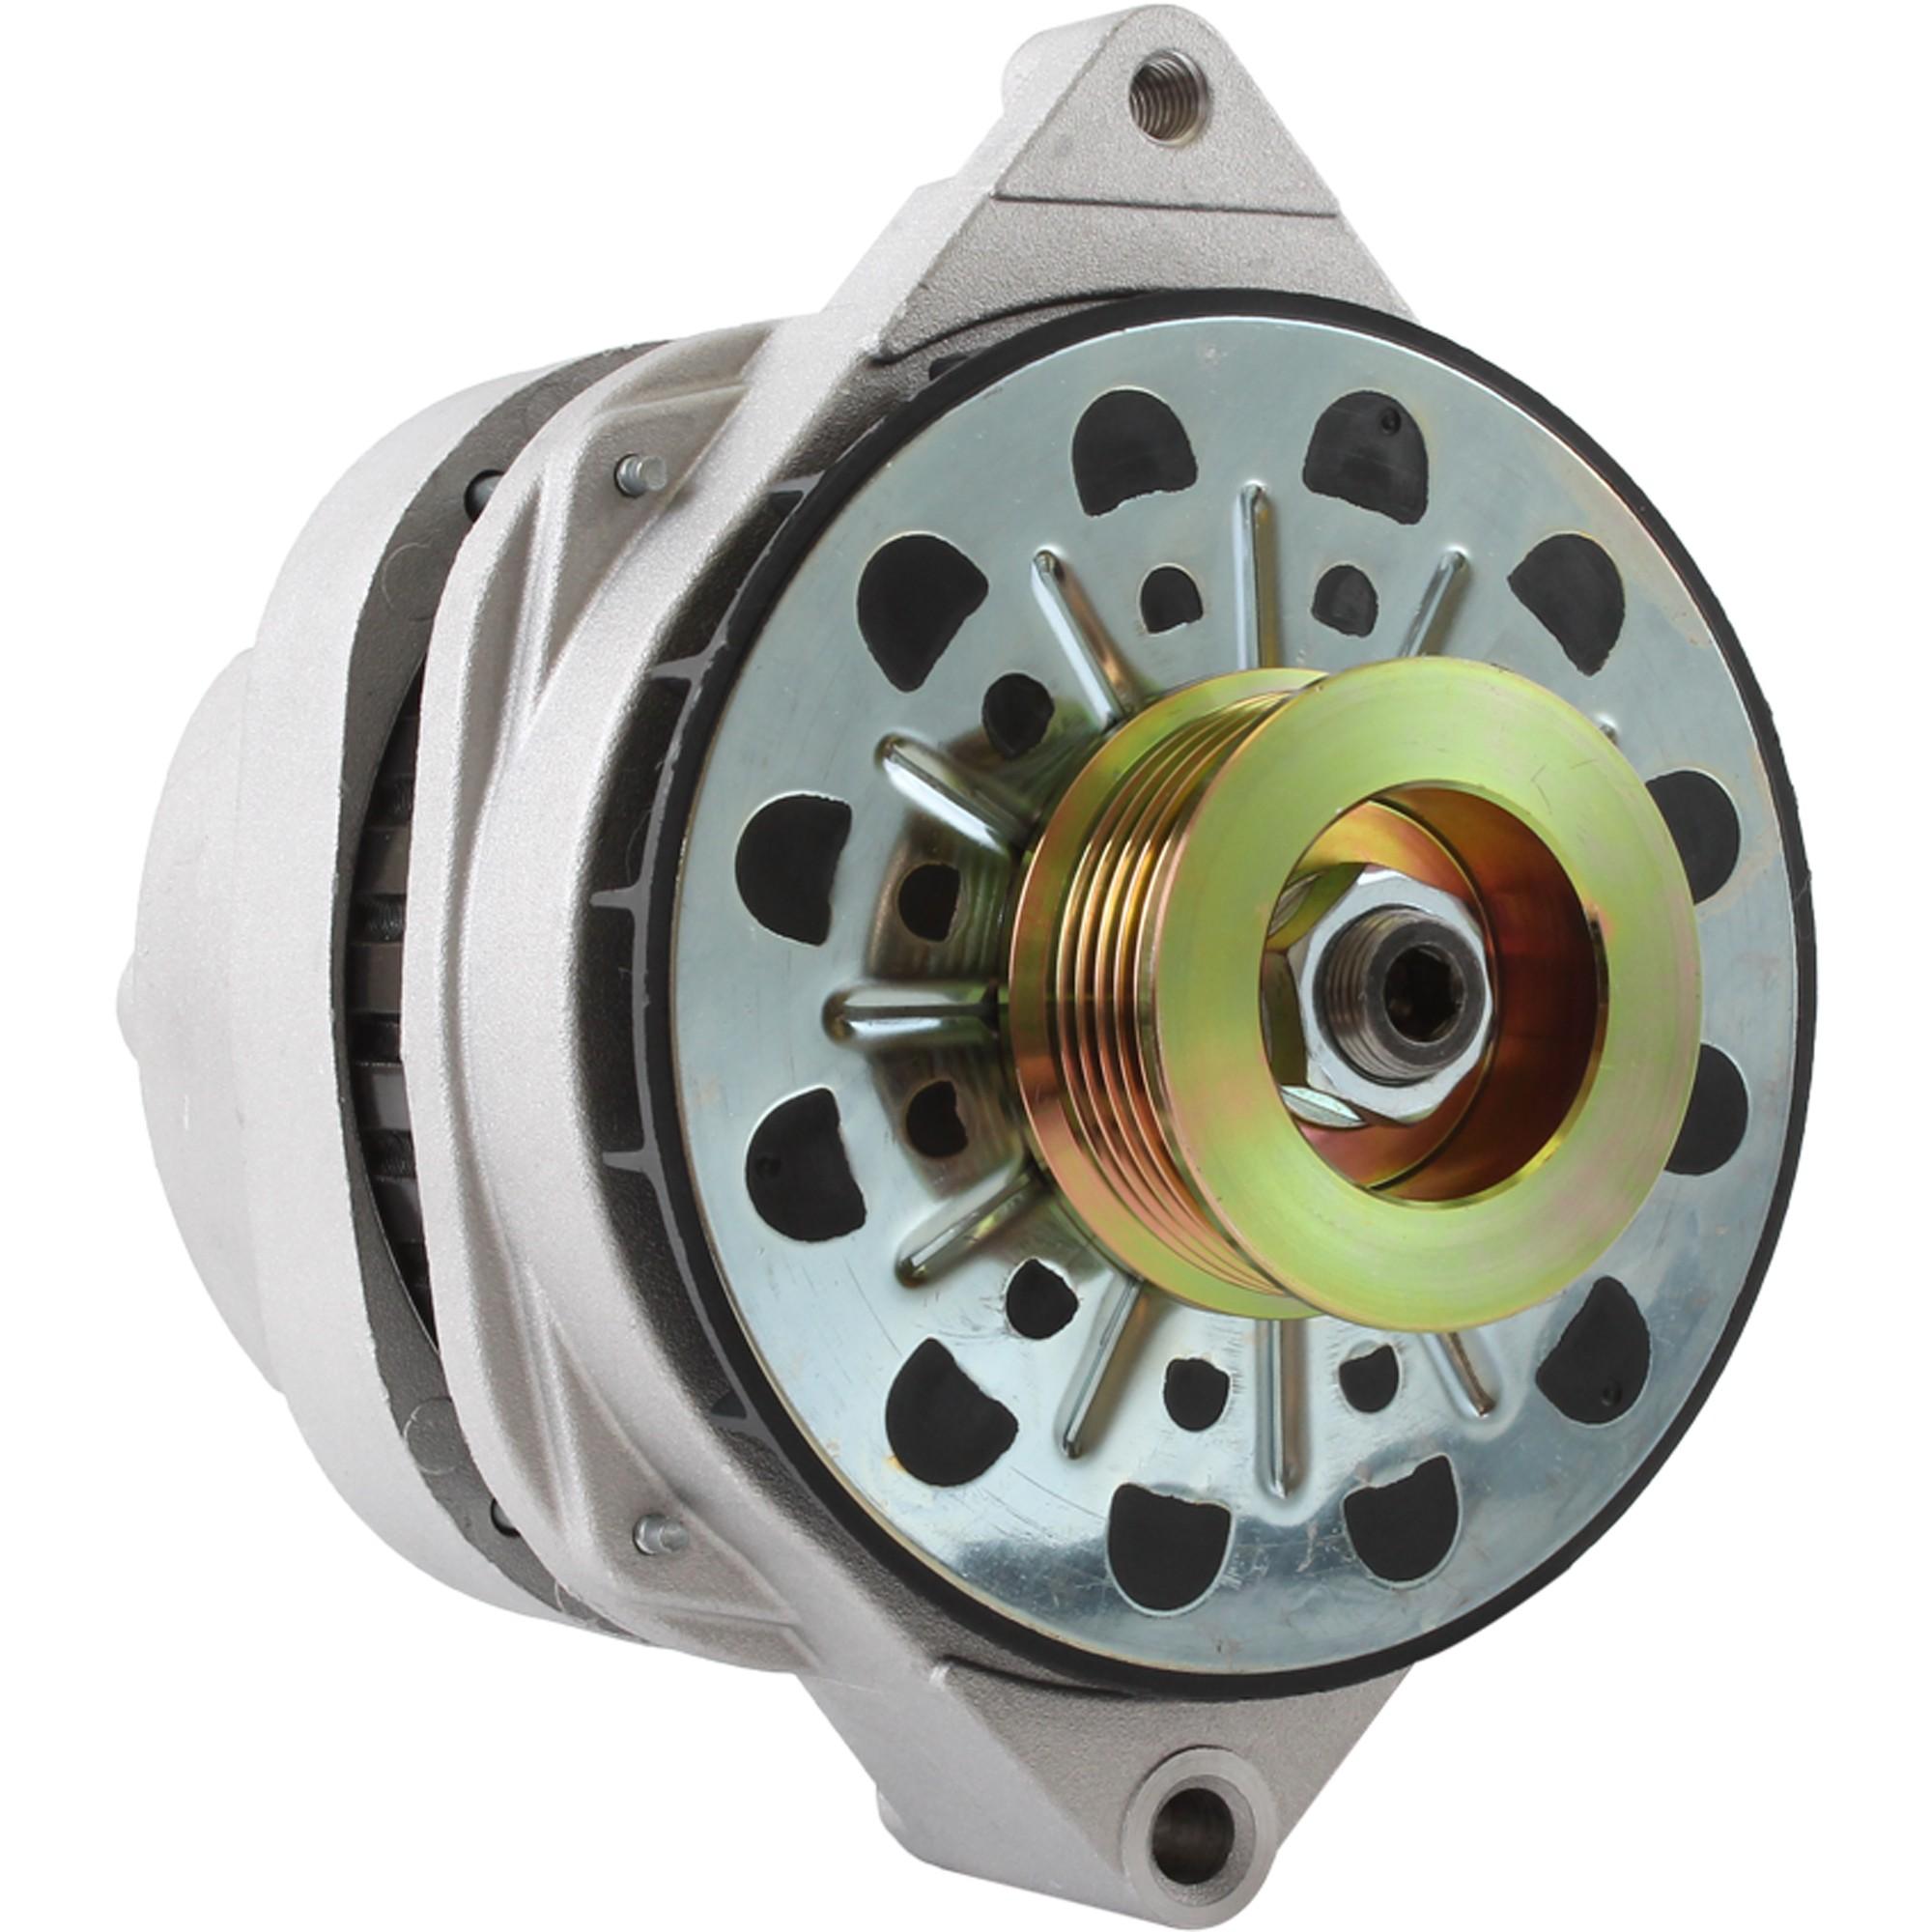 alternator high output 200 amp 4 6l cadillac seville 93 94 95 96 97 eldorado ebay ebay